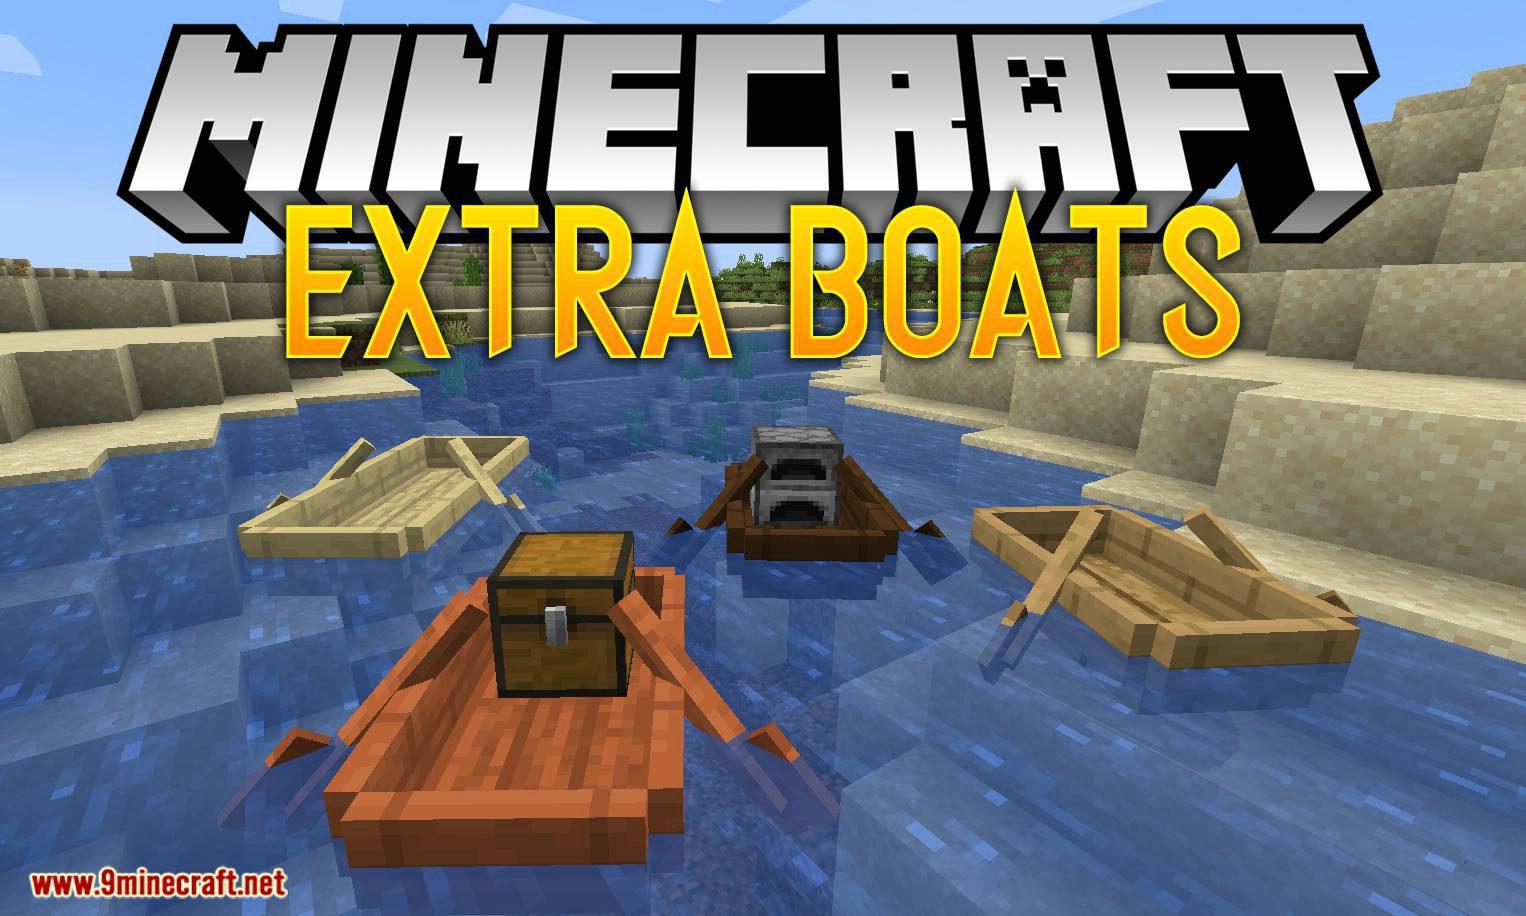 Extra Boats mod for minecraft logo